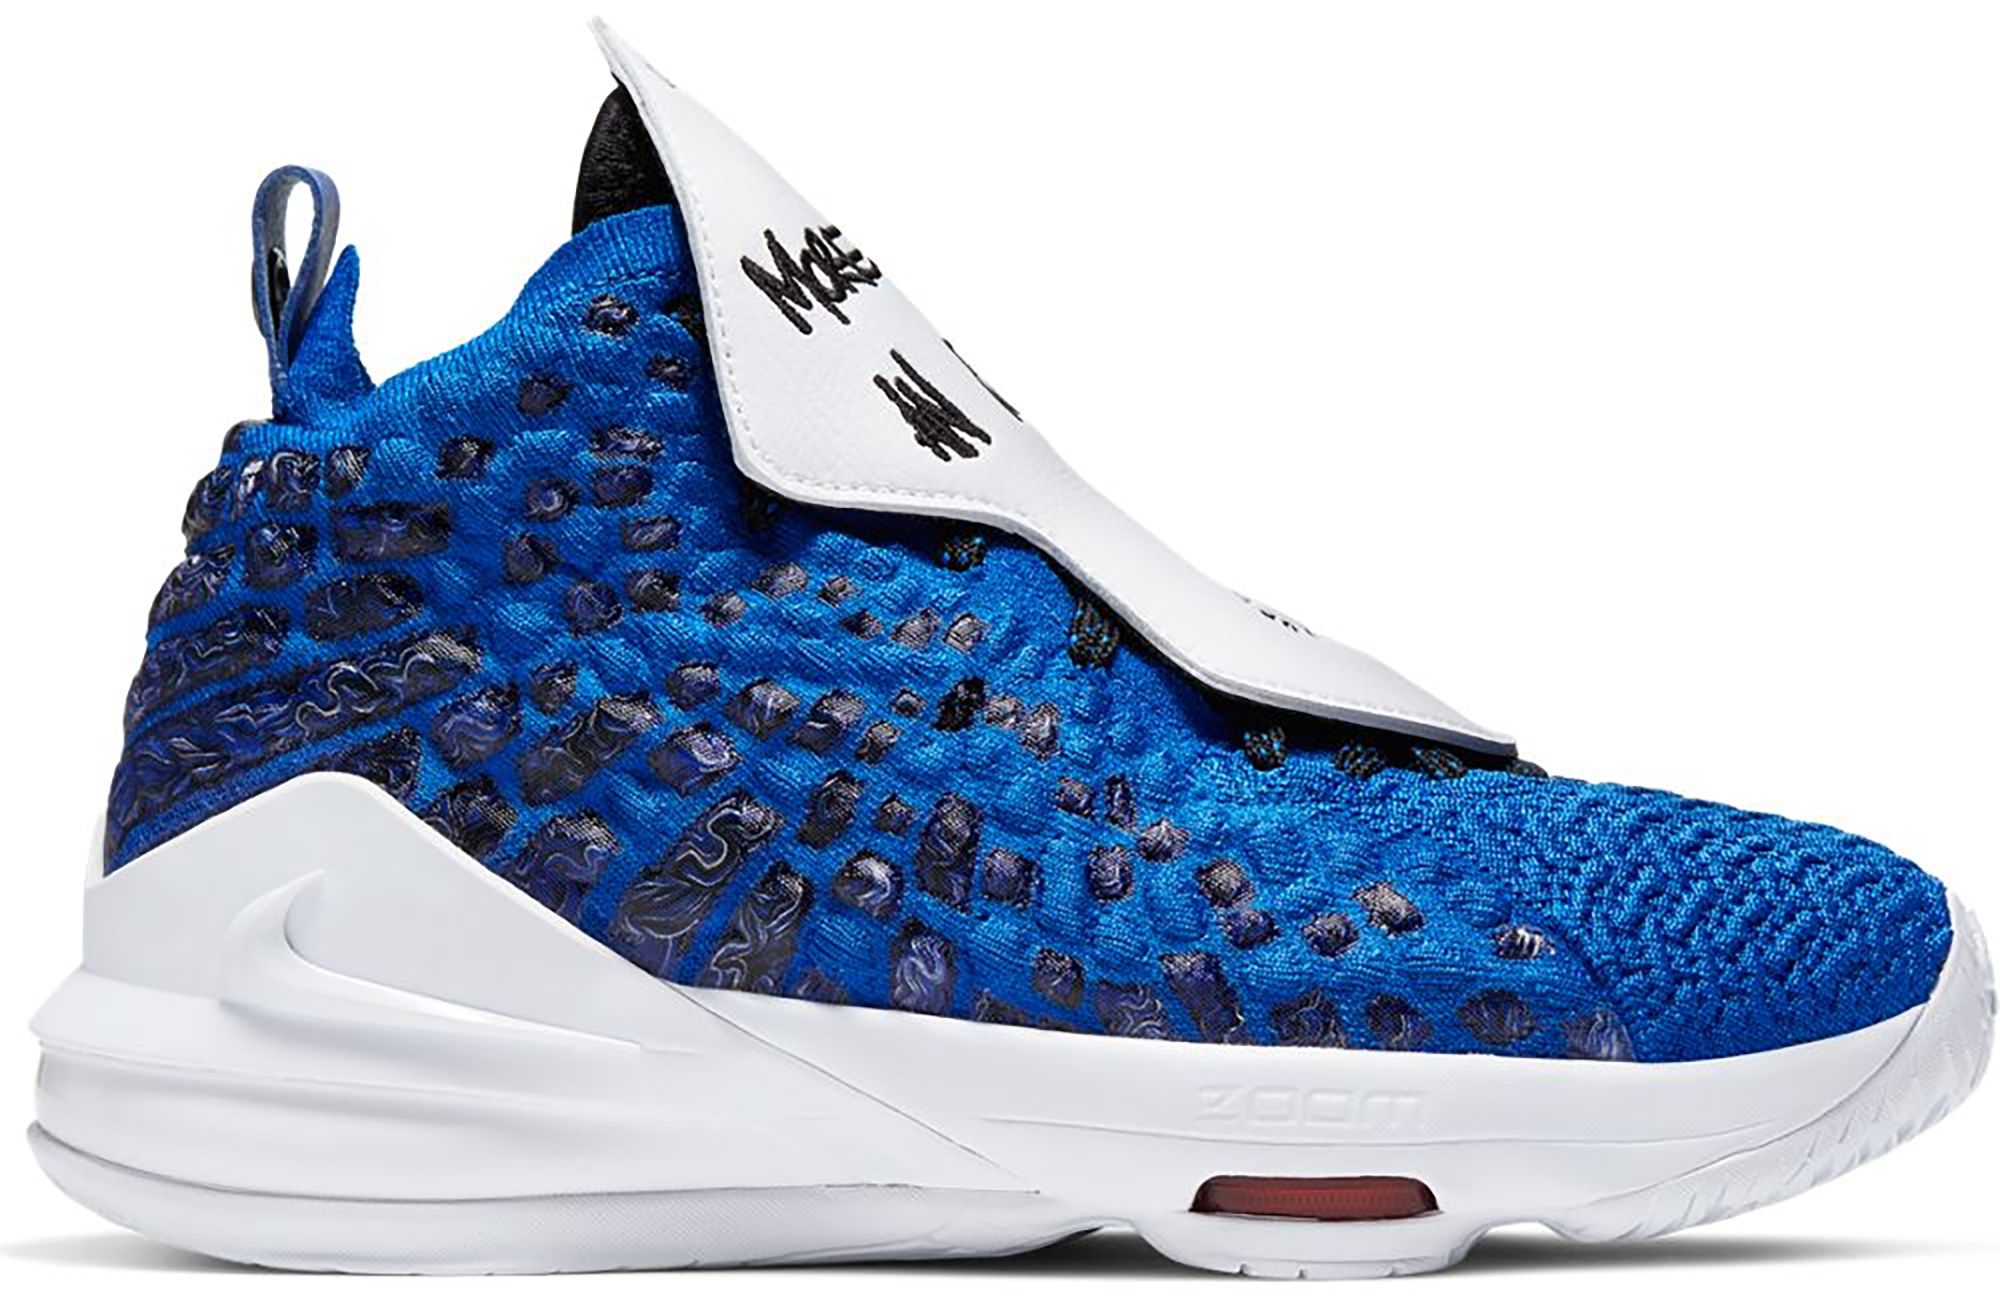 Nike LeBron 17 More Than An Athlete (GS